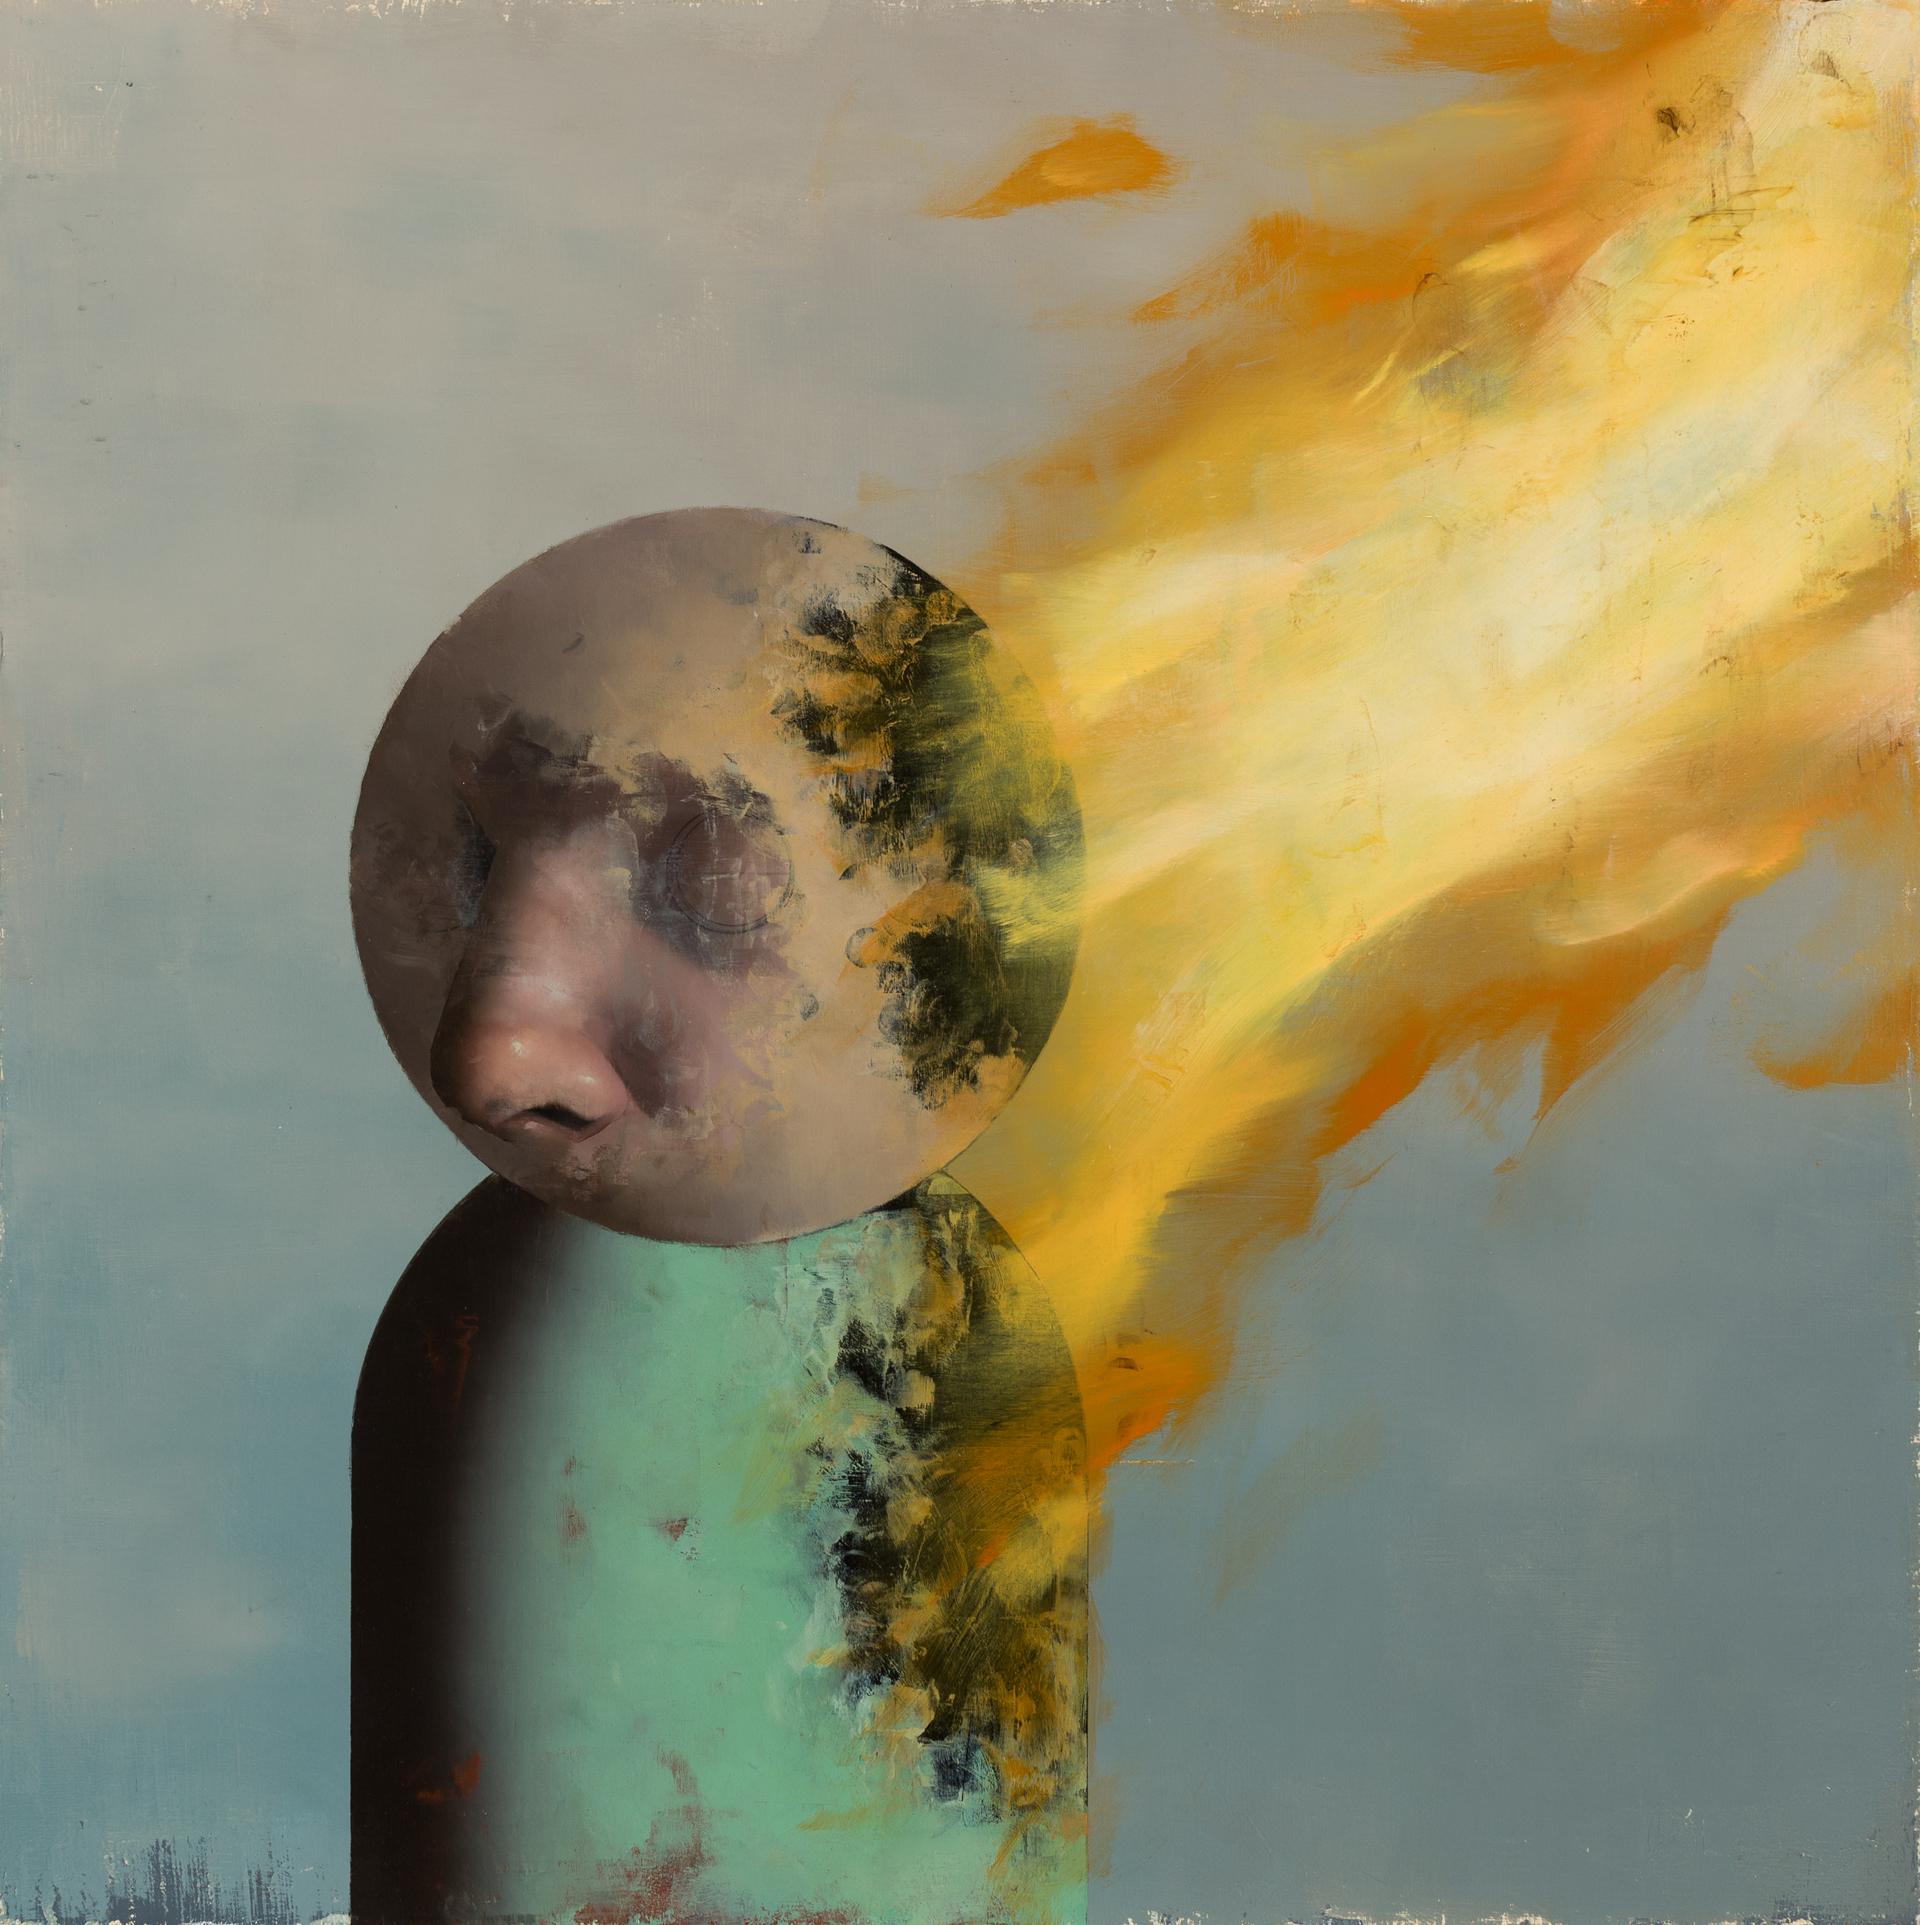 Fever Dream by Matthew Saba